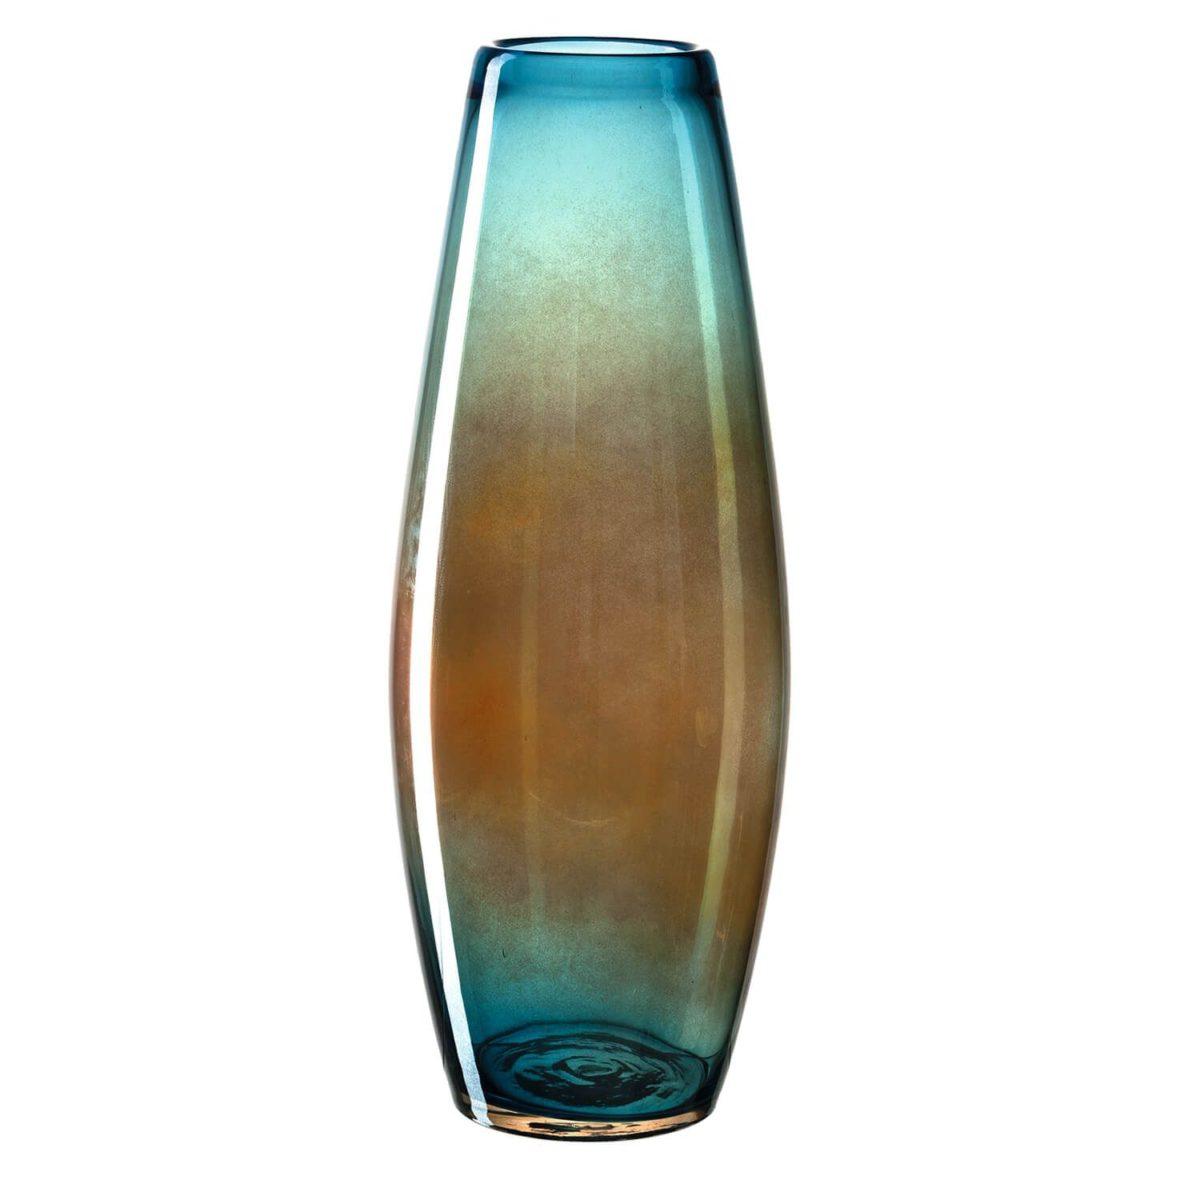 020805 0 k 1200x1200 - Vaza Lucente LEONARDO (L020805)